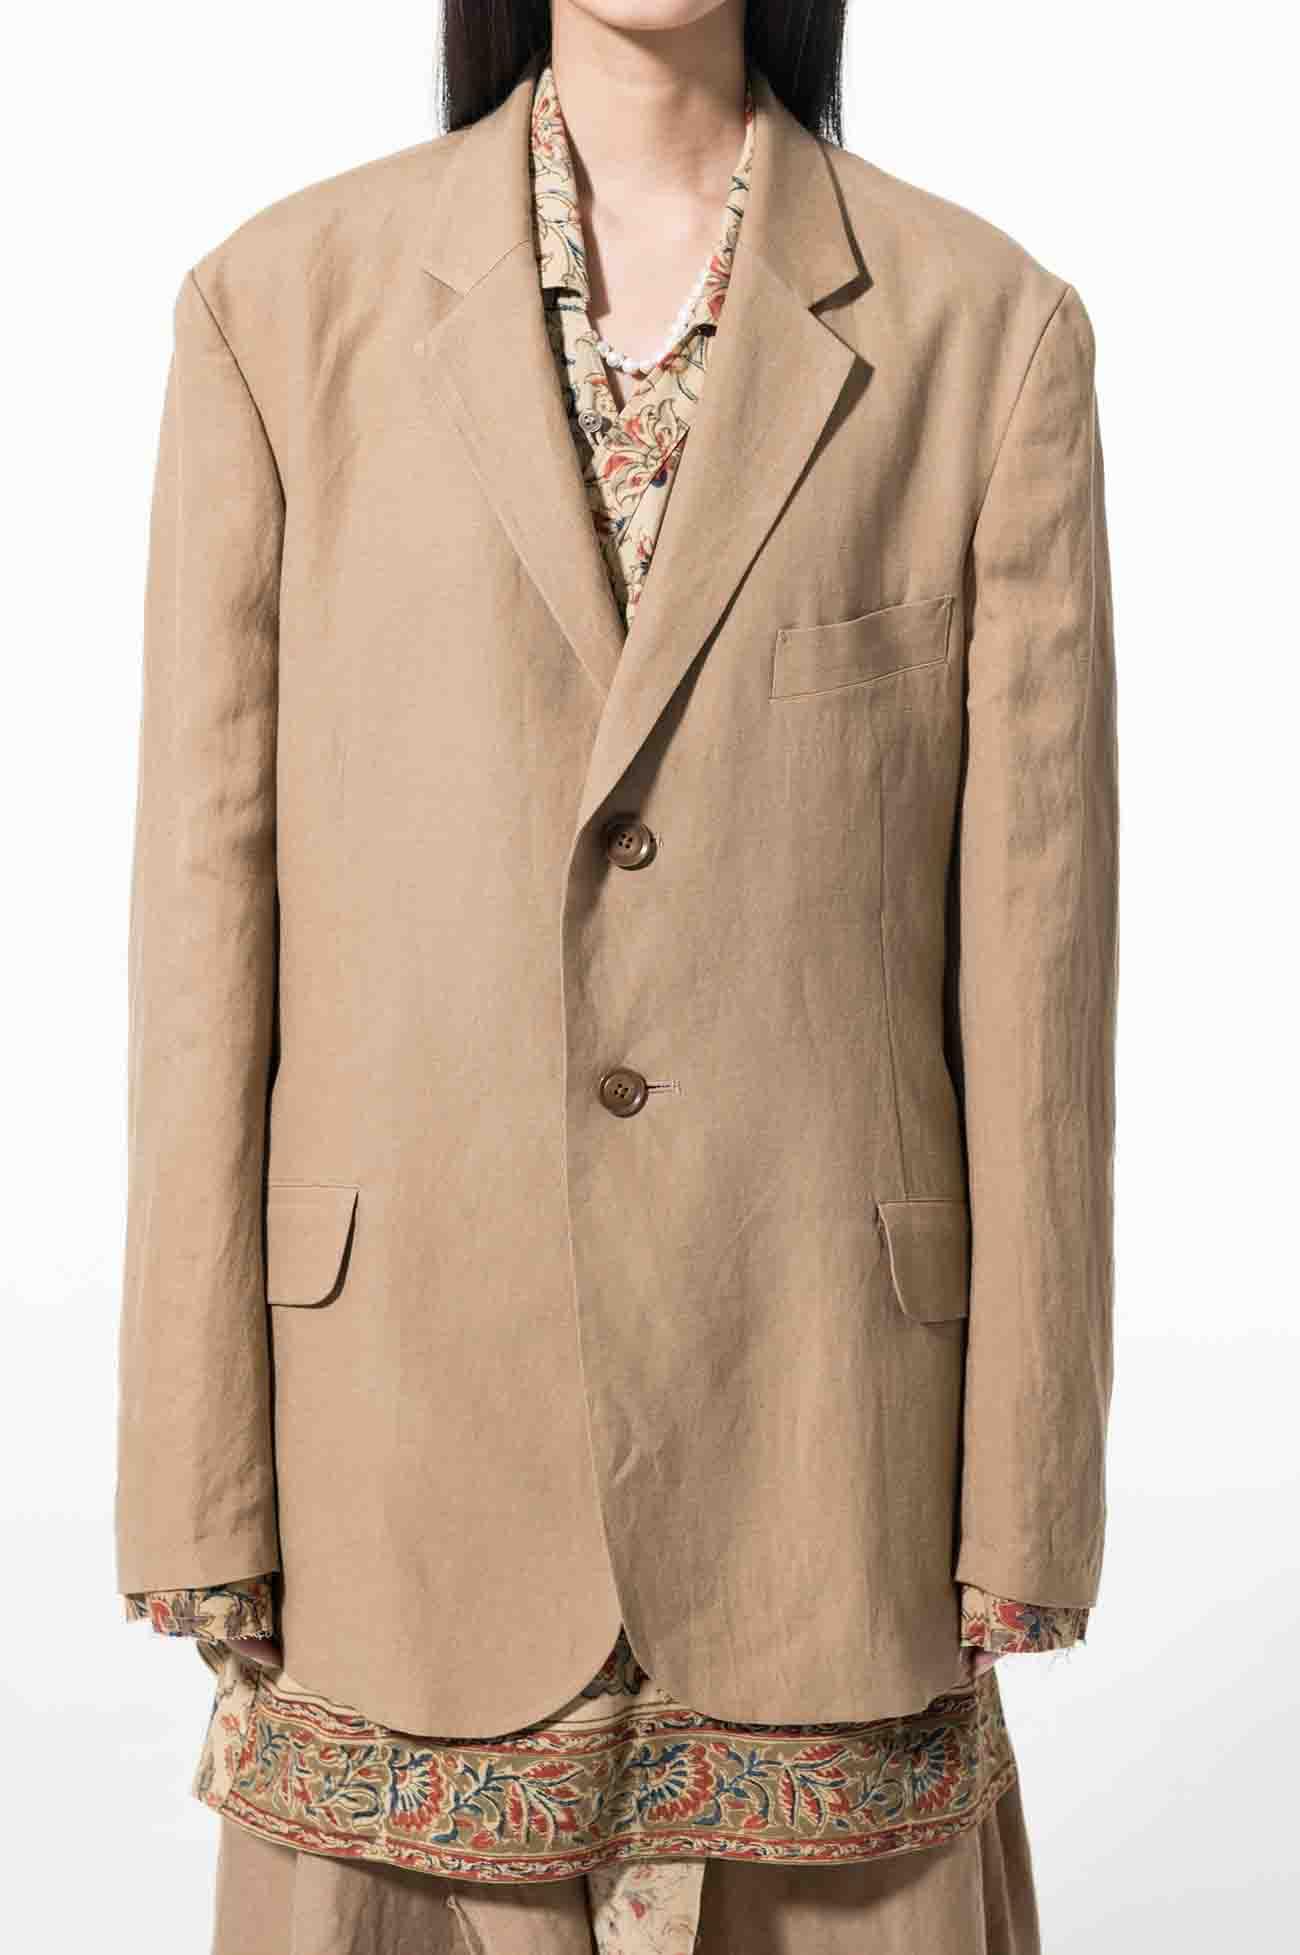 Ry/Li Easy Cross Indian Layer 2BS Slim Jacket